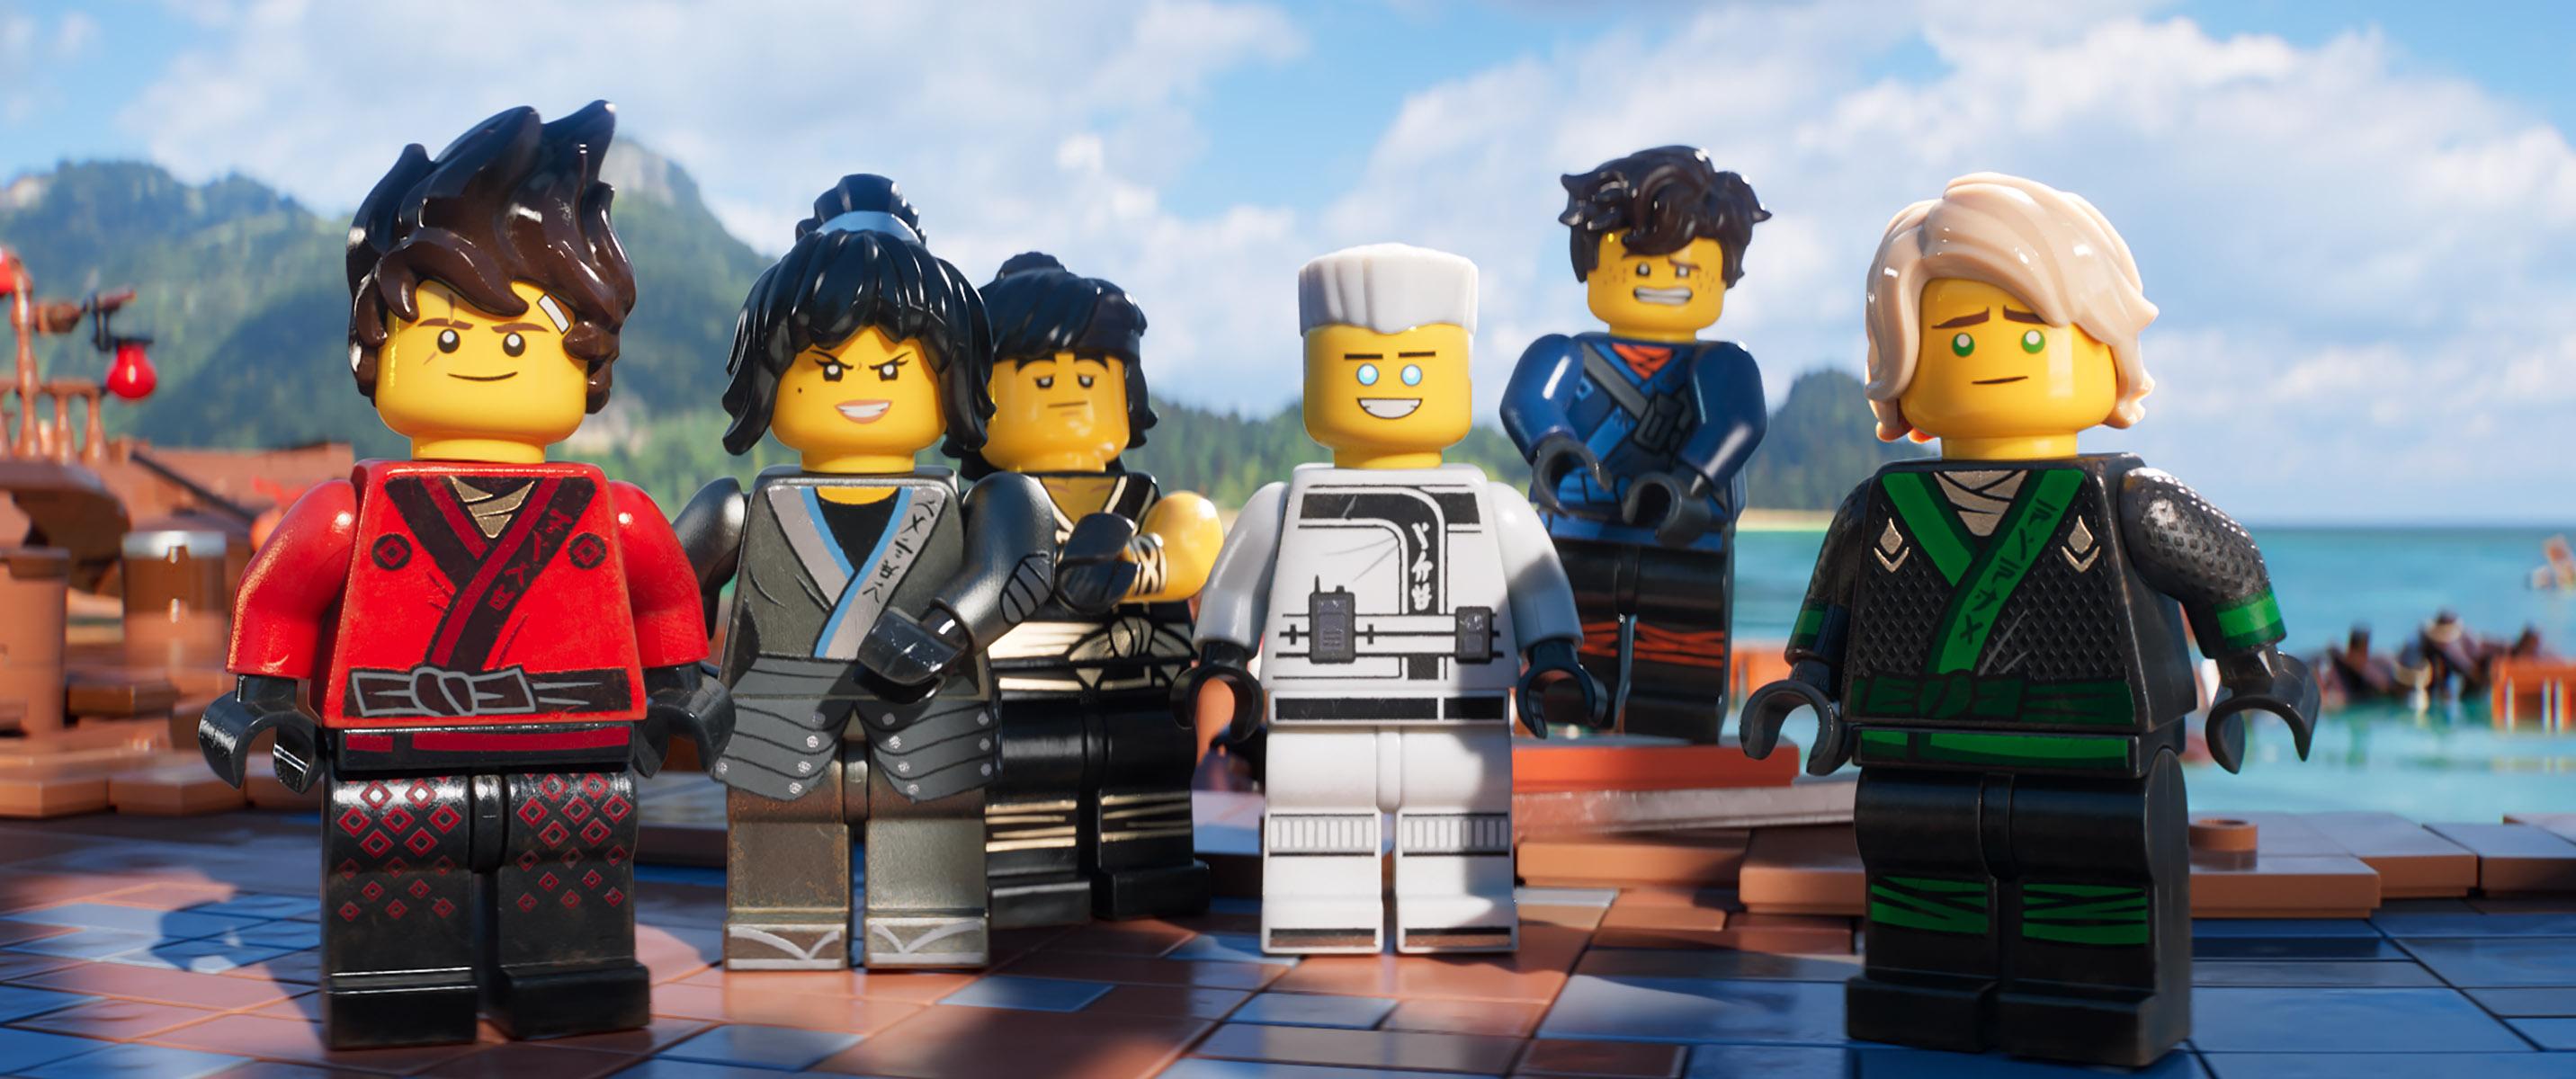 LEGO Ninjago - O Filme - Foto